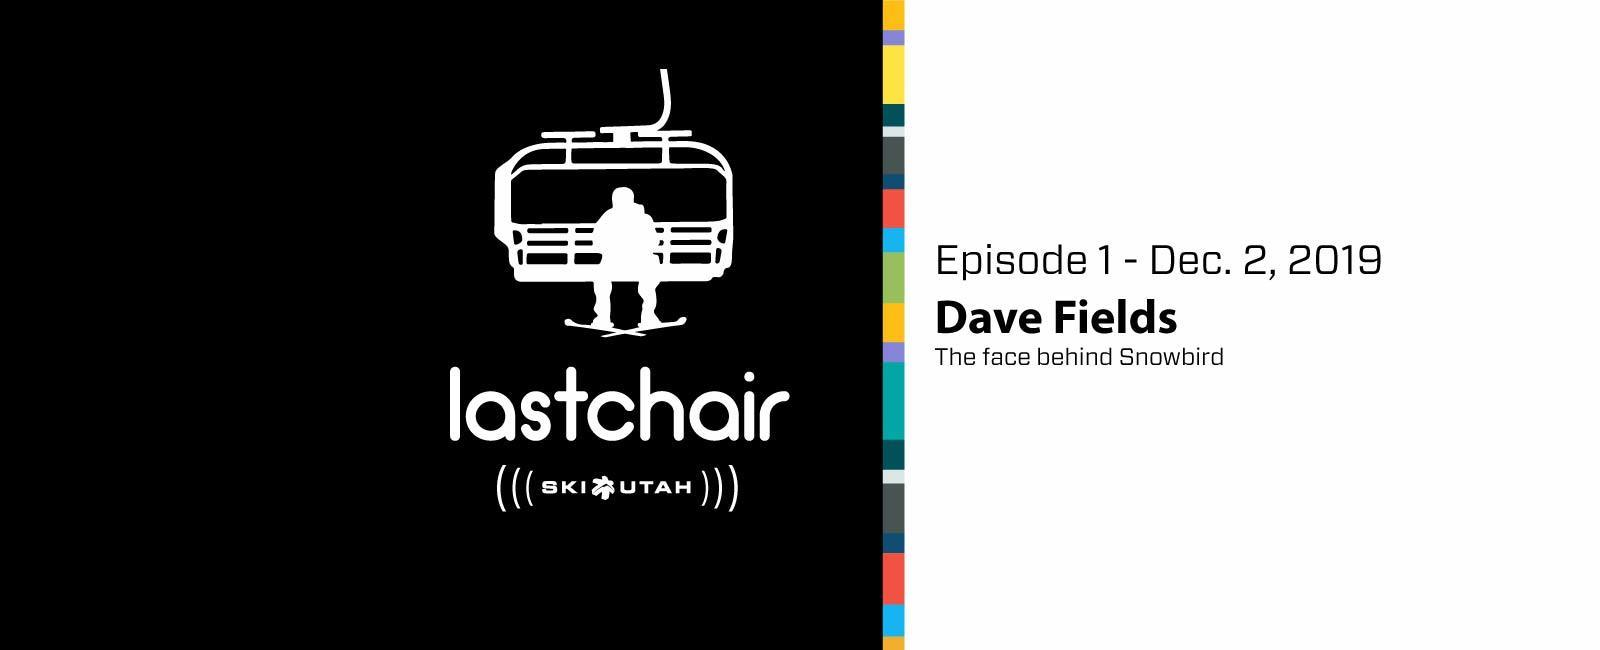 Dave Fields: The face behind Snowbird